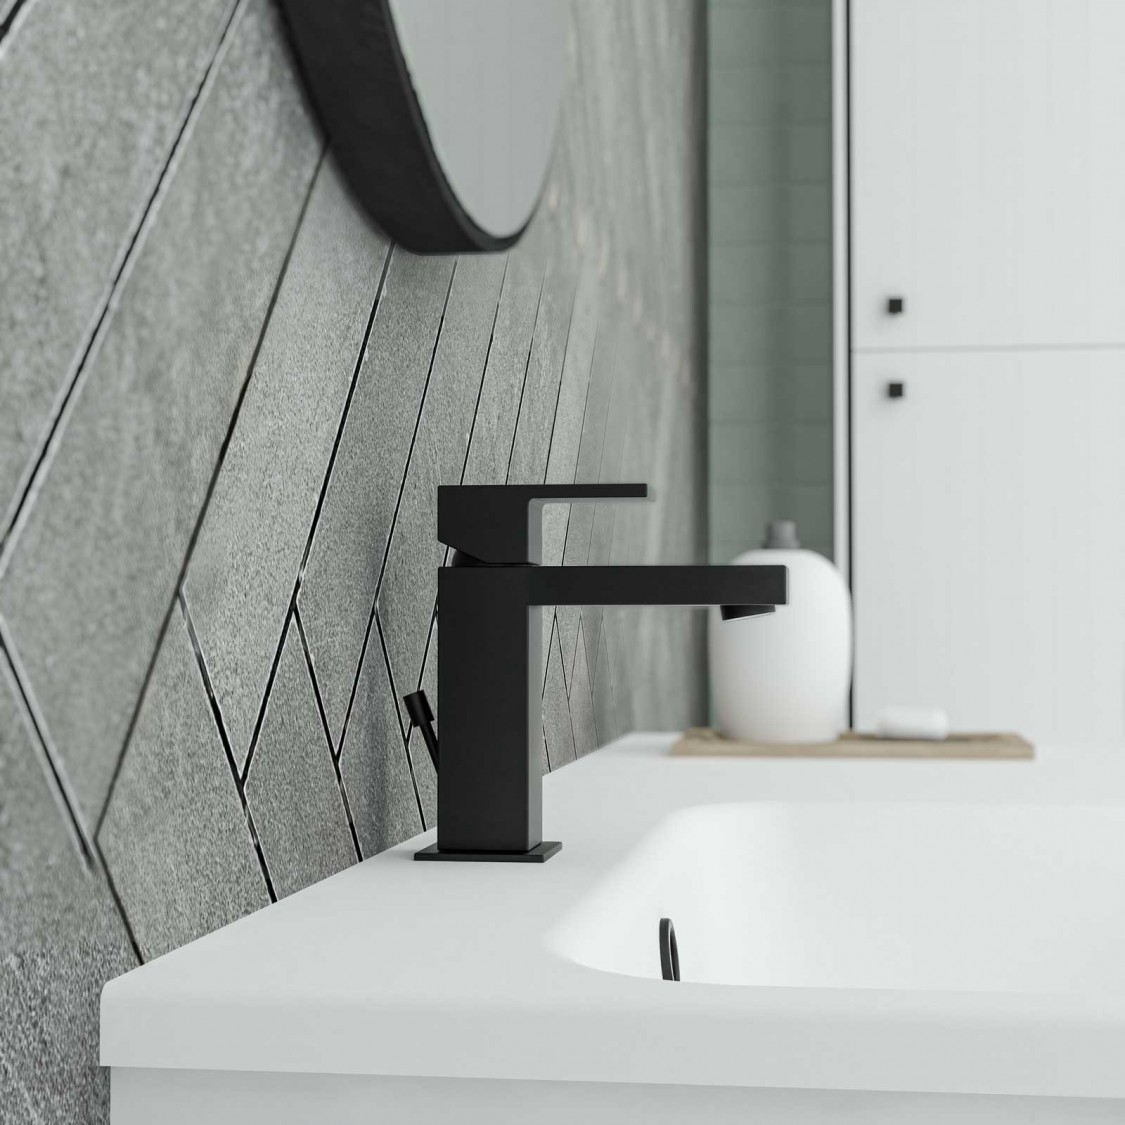 Rubinetteria e miscelatori lavabo bagno | Shop Online Idroplus